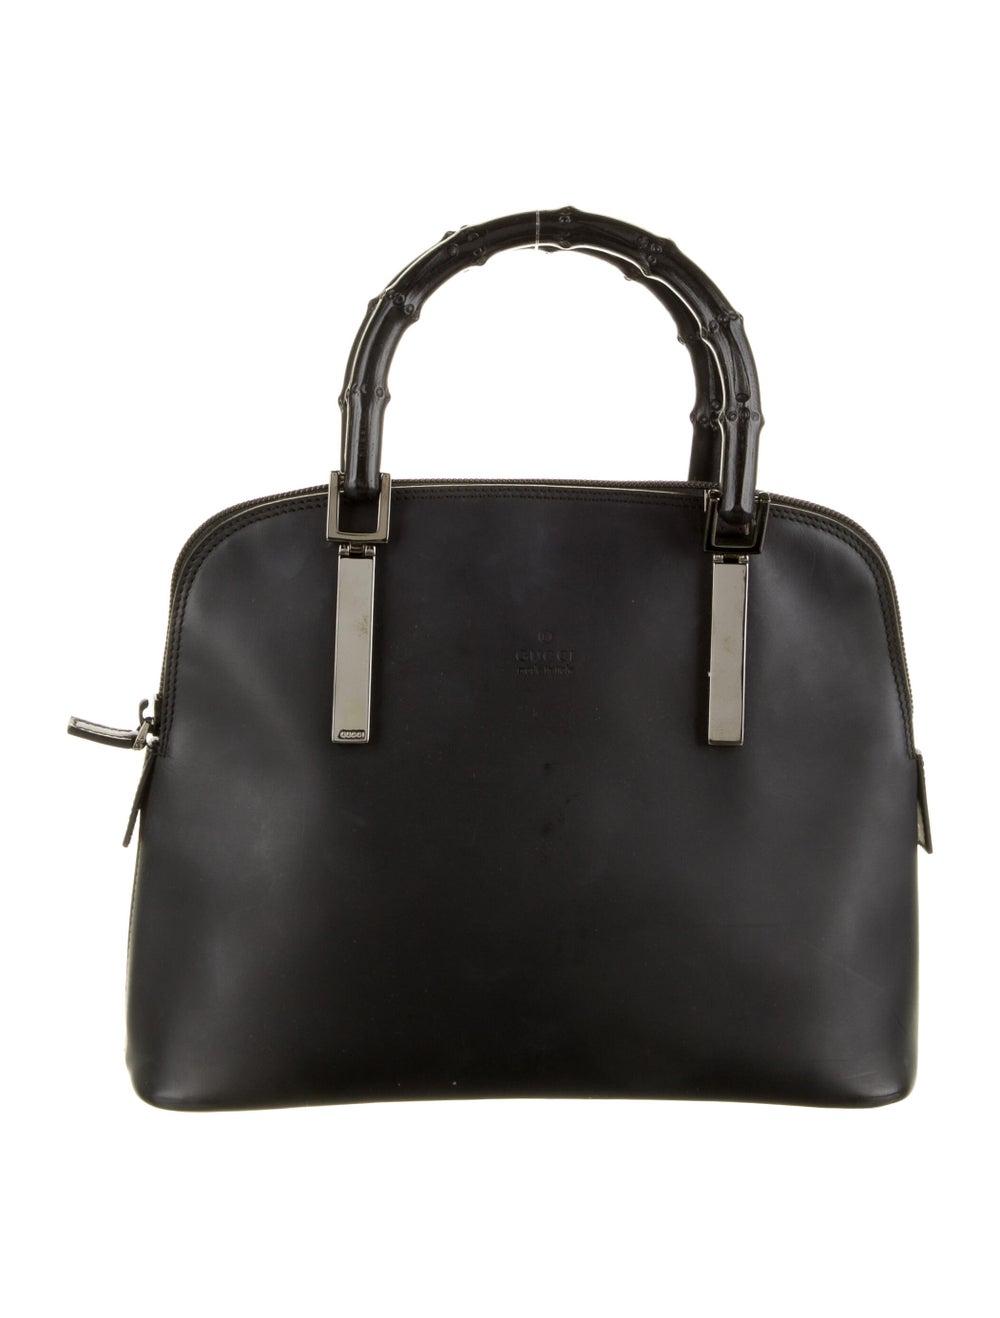 Gucci Bamboo Top Handle Bag Black - image 1